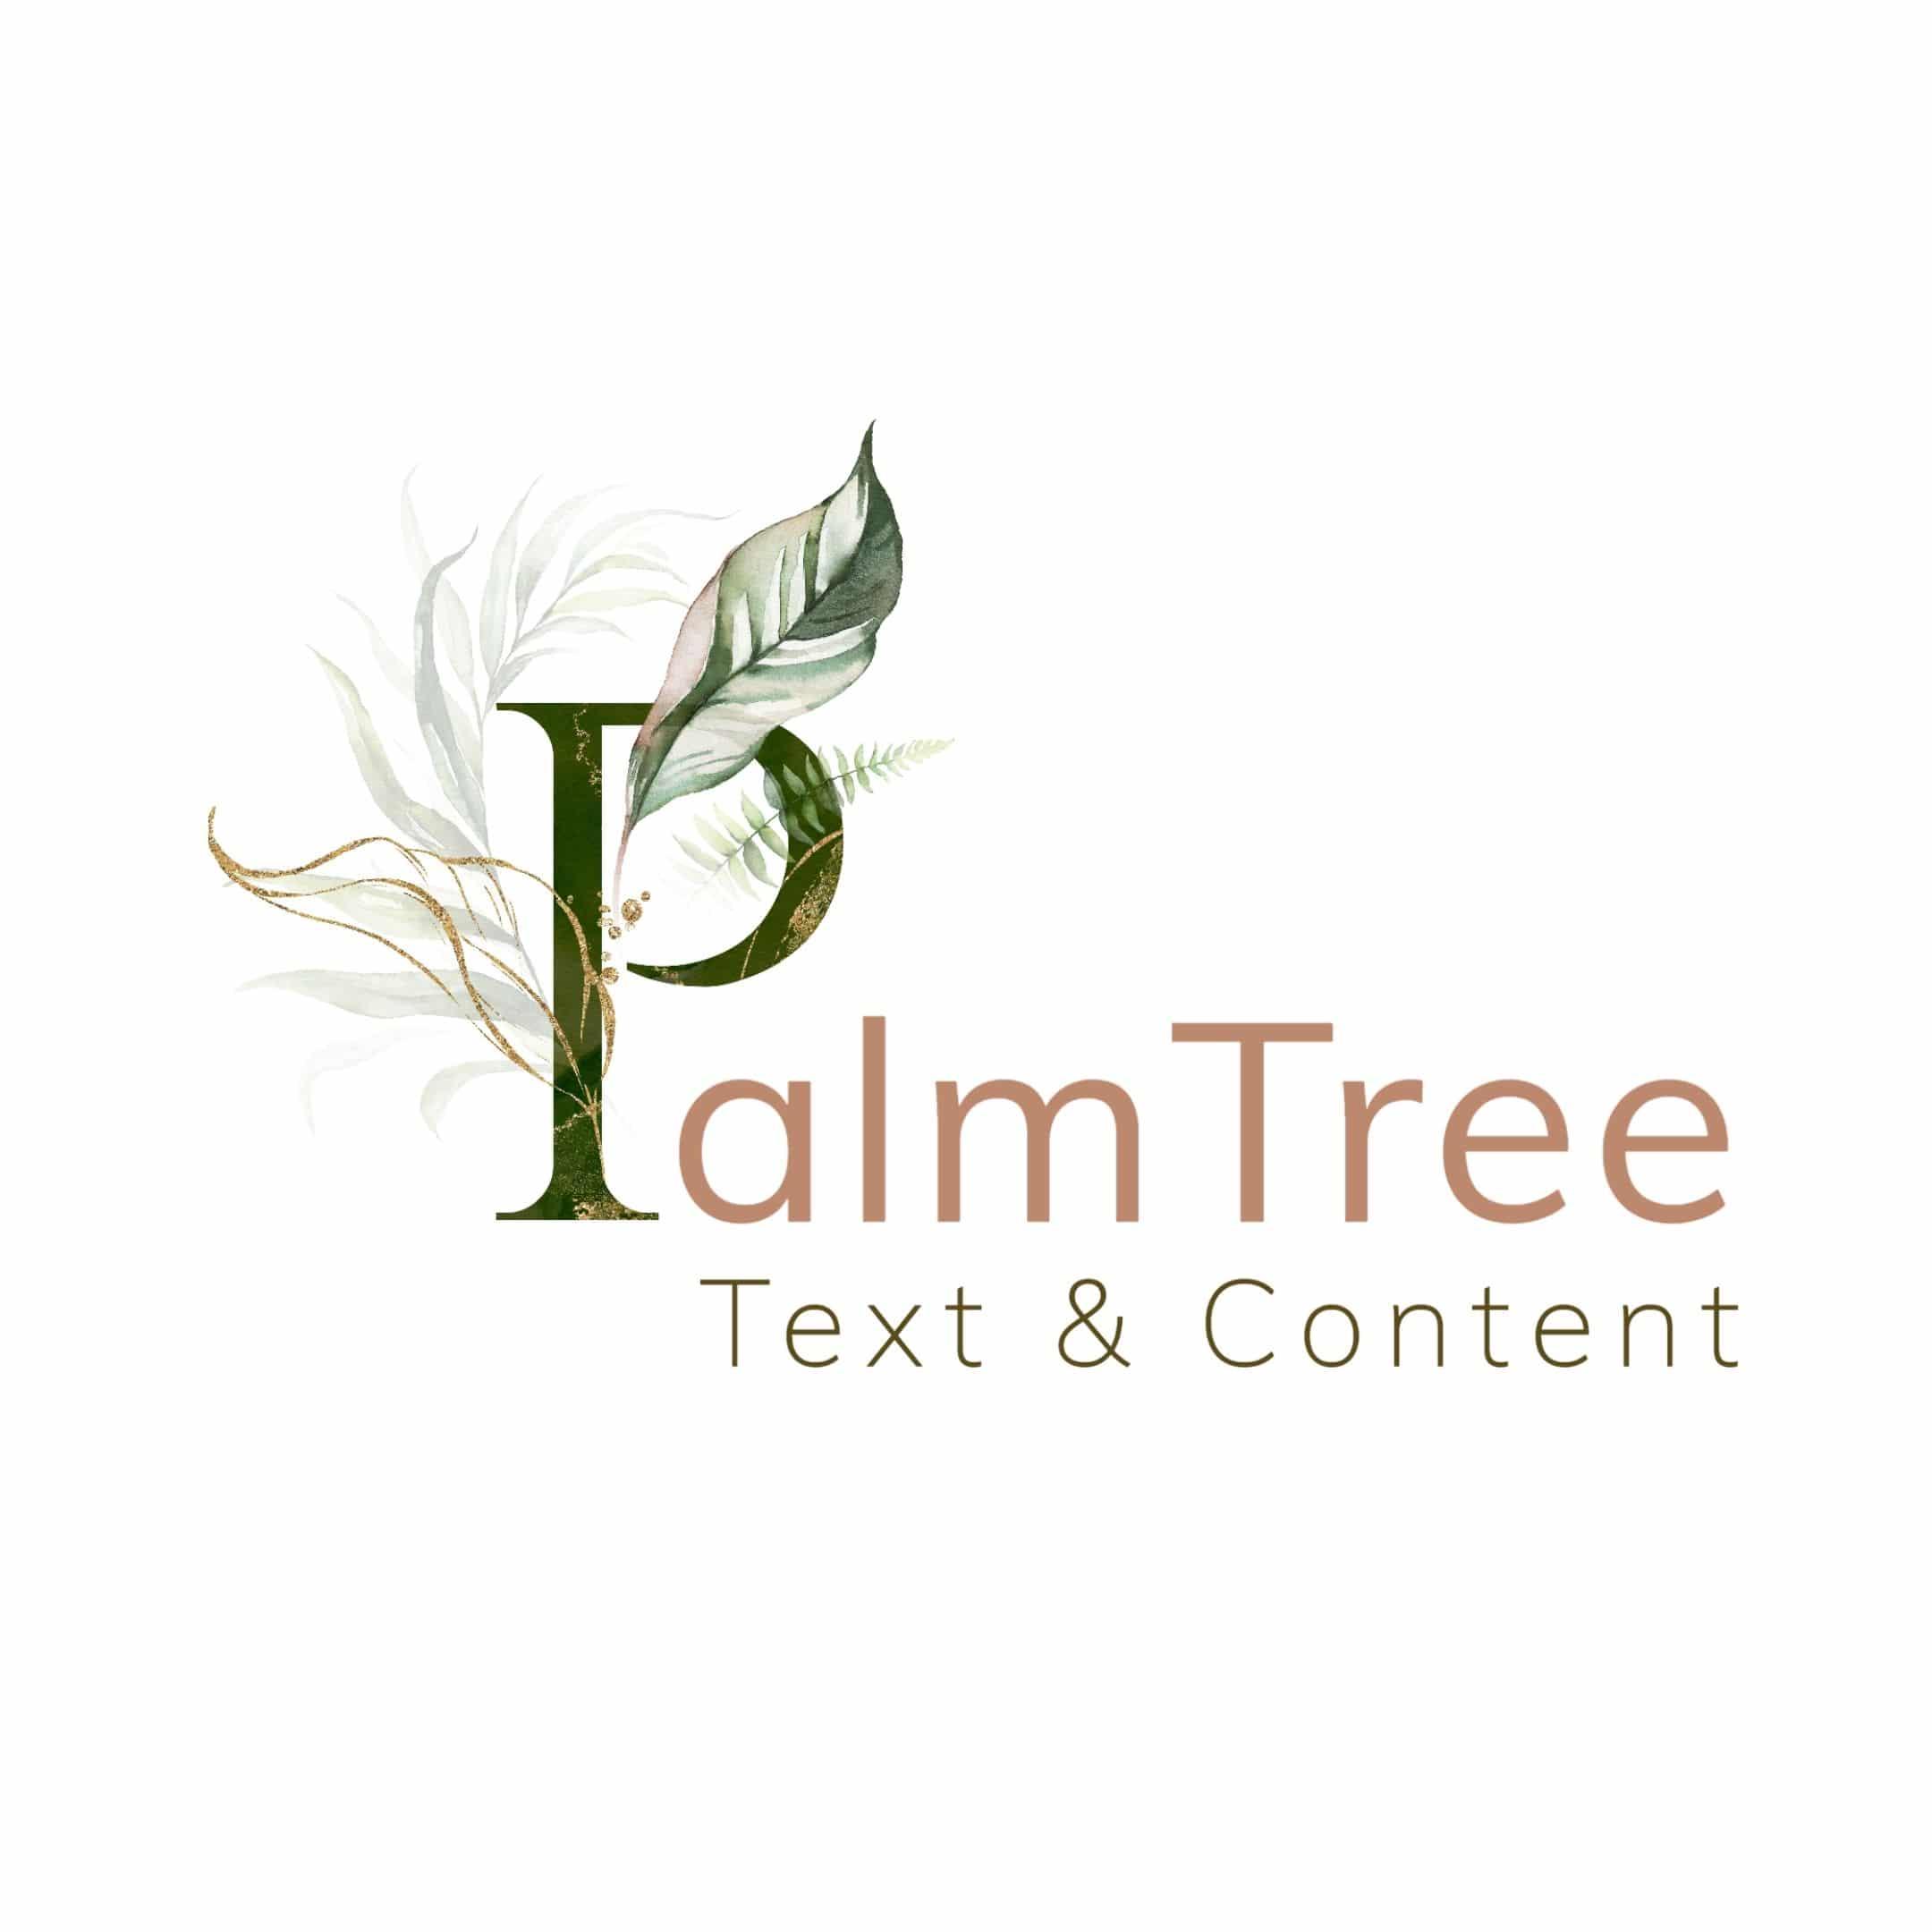 PalmTree Text & Content